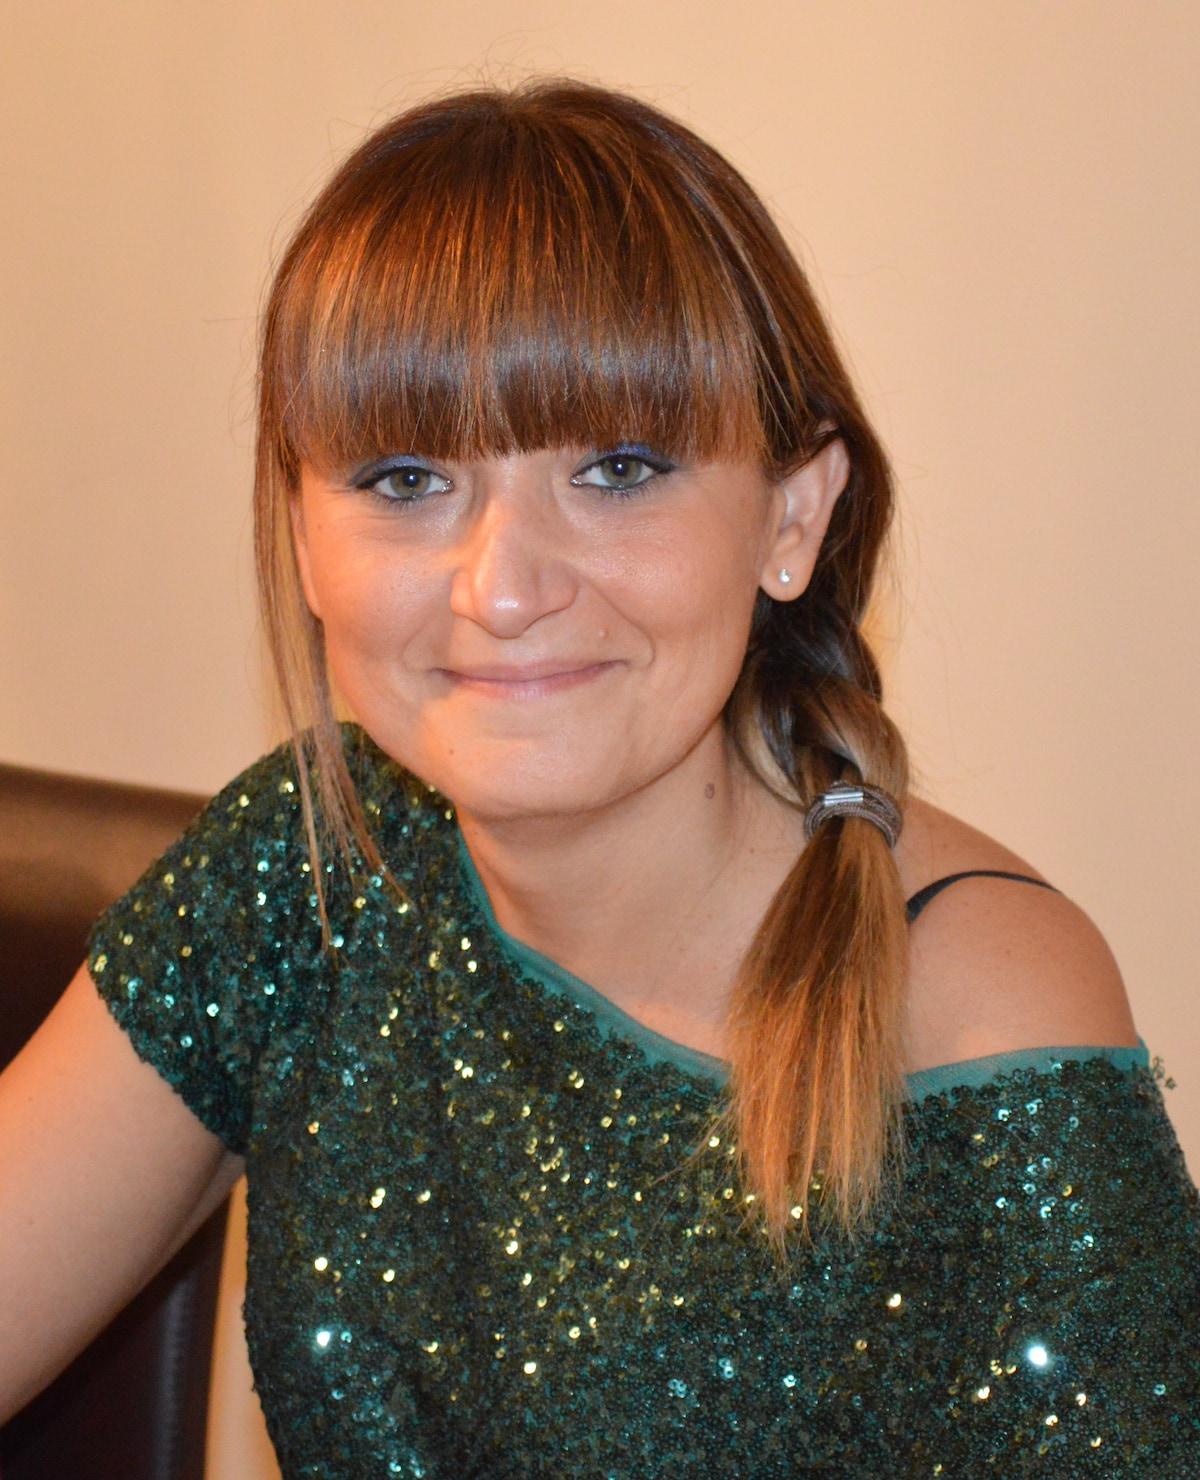 Elisa from Vipiteno